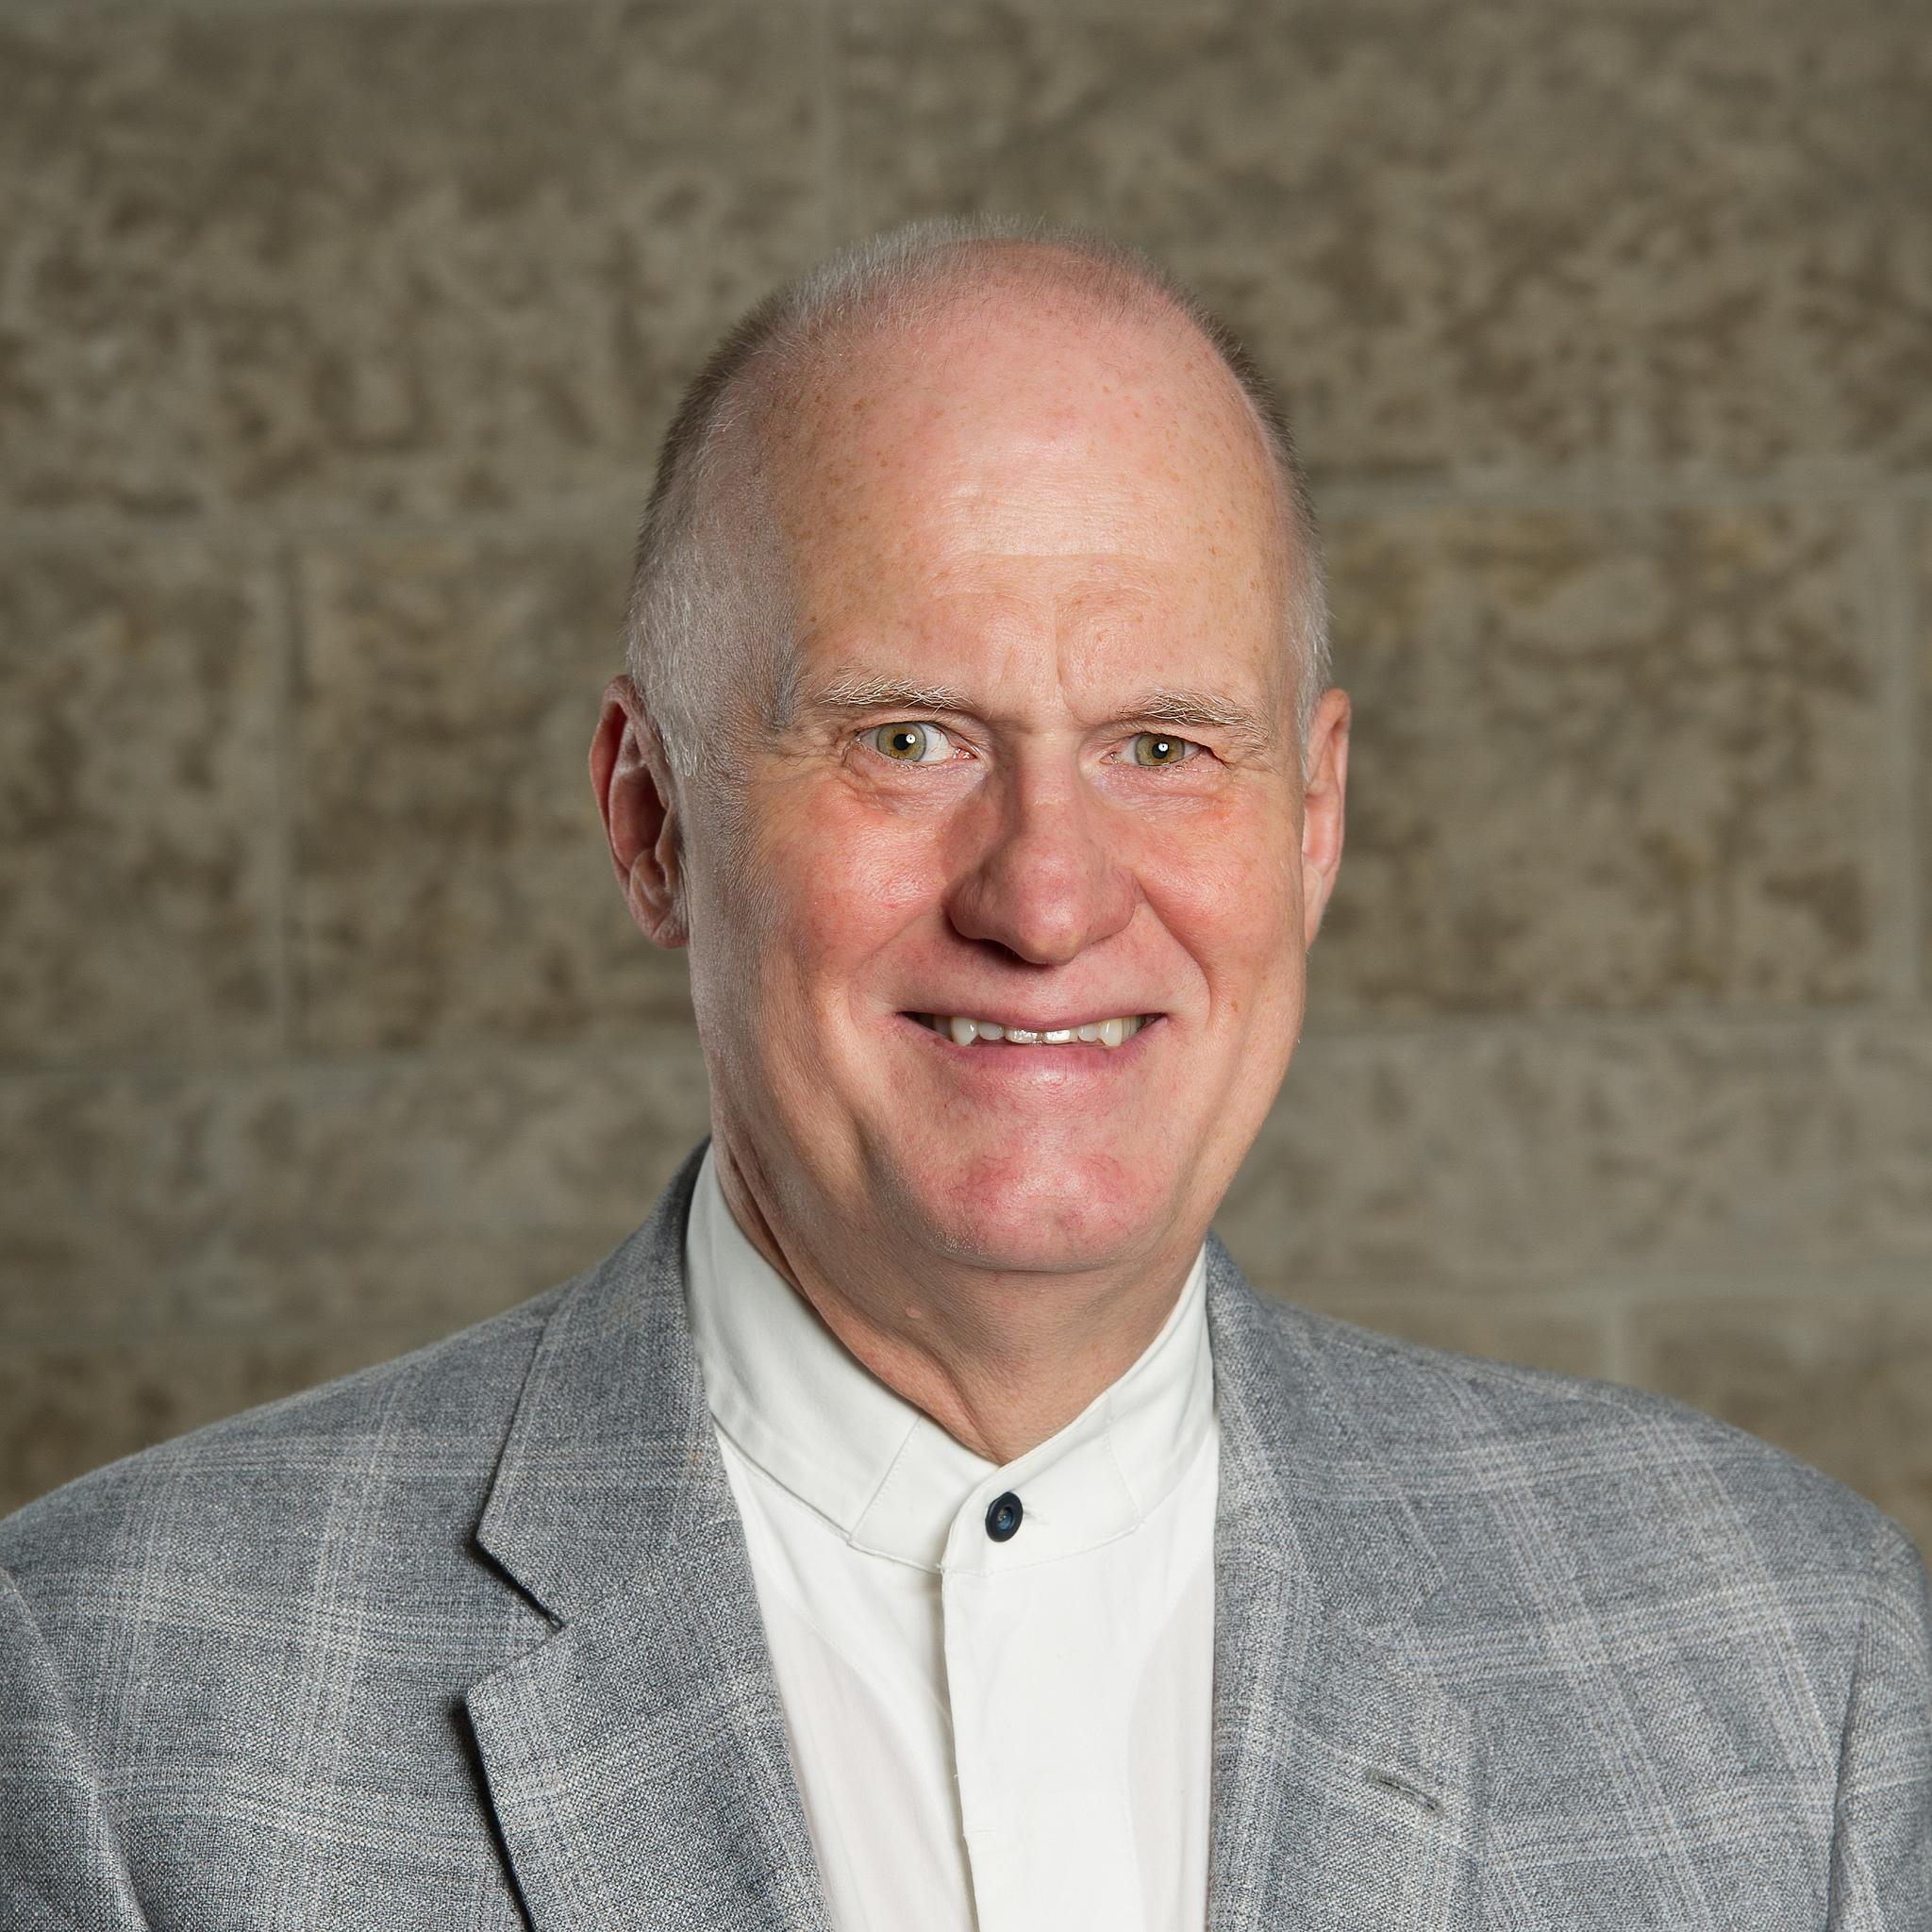 Terry Blake